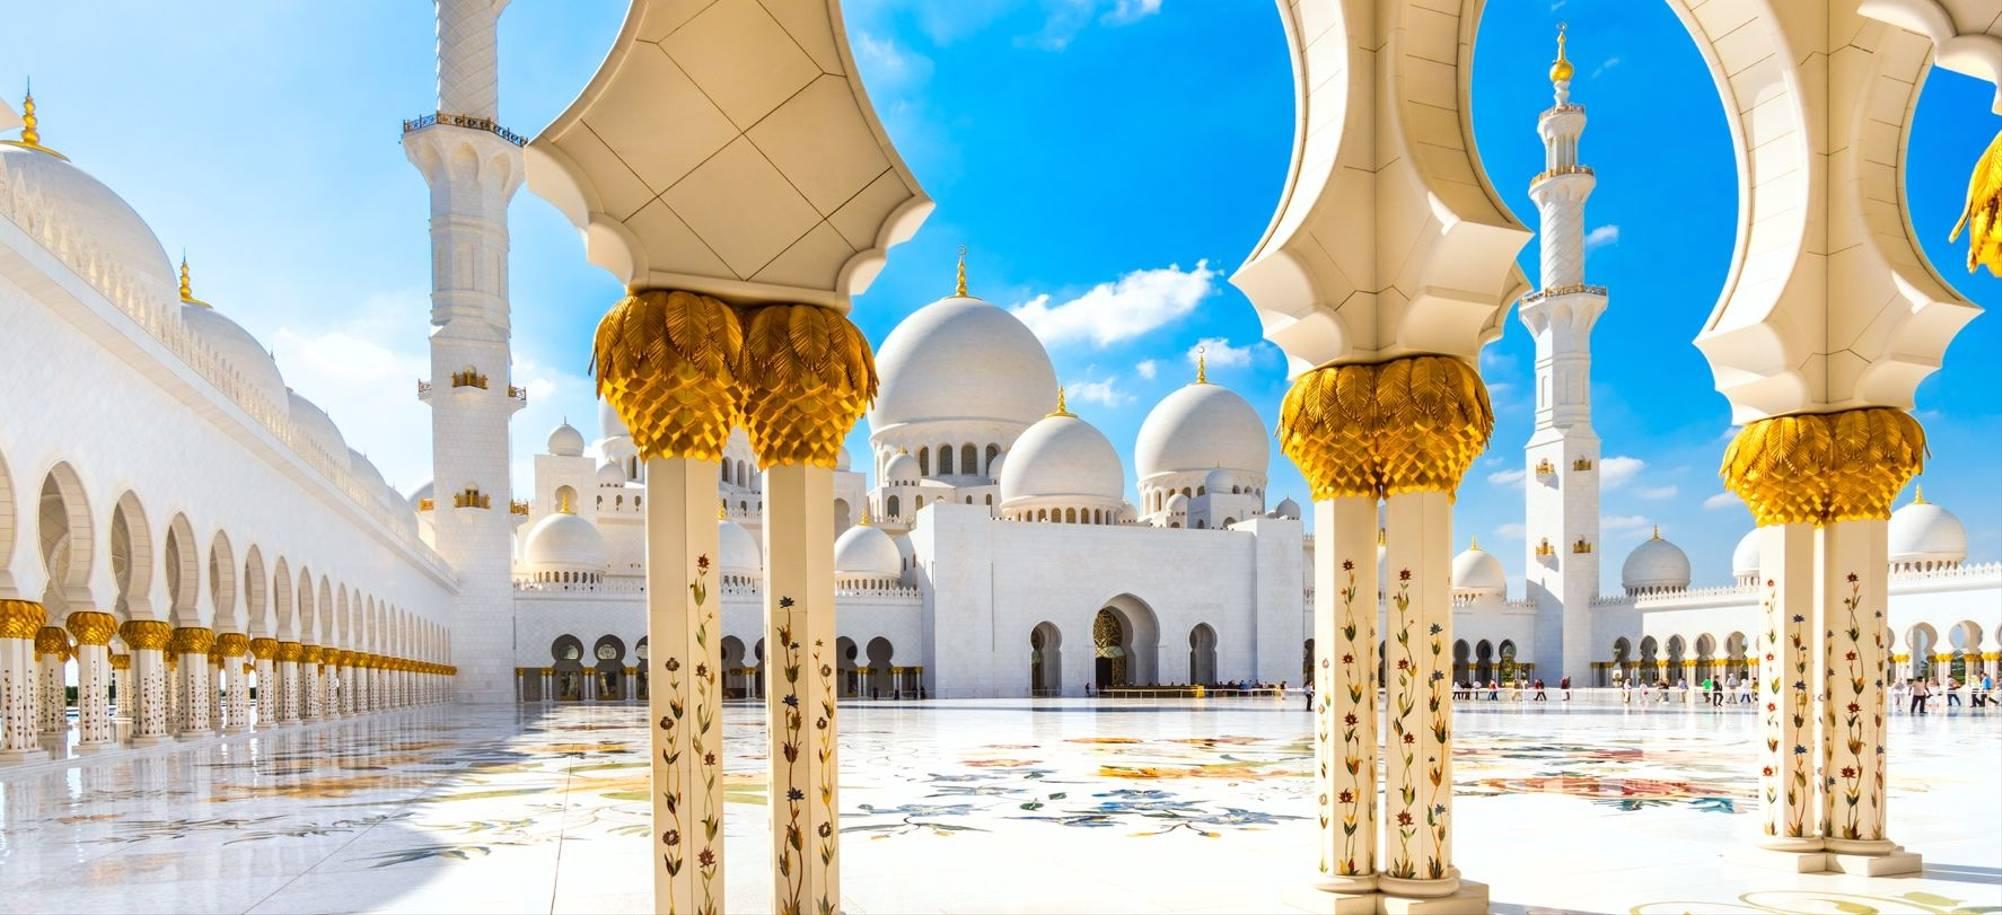 9 10 Day   Abu Dhabi  Sheikh Zayed Mosque   Itinerary Desktop